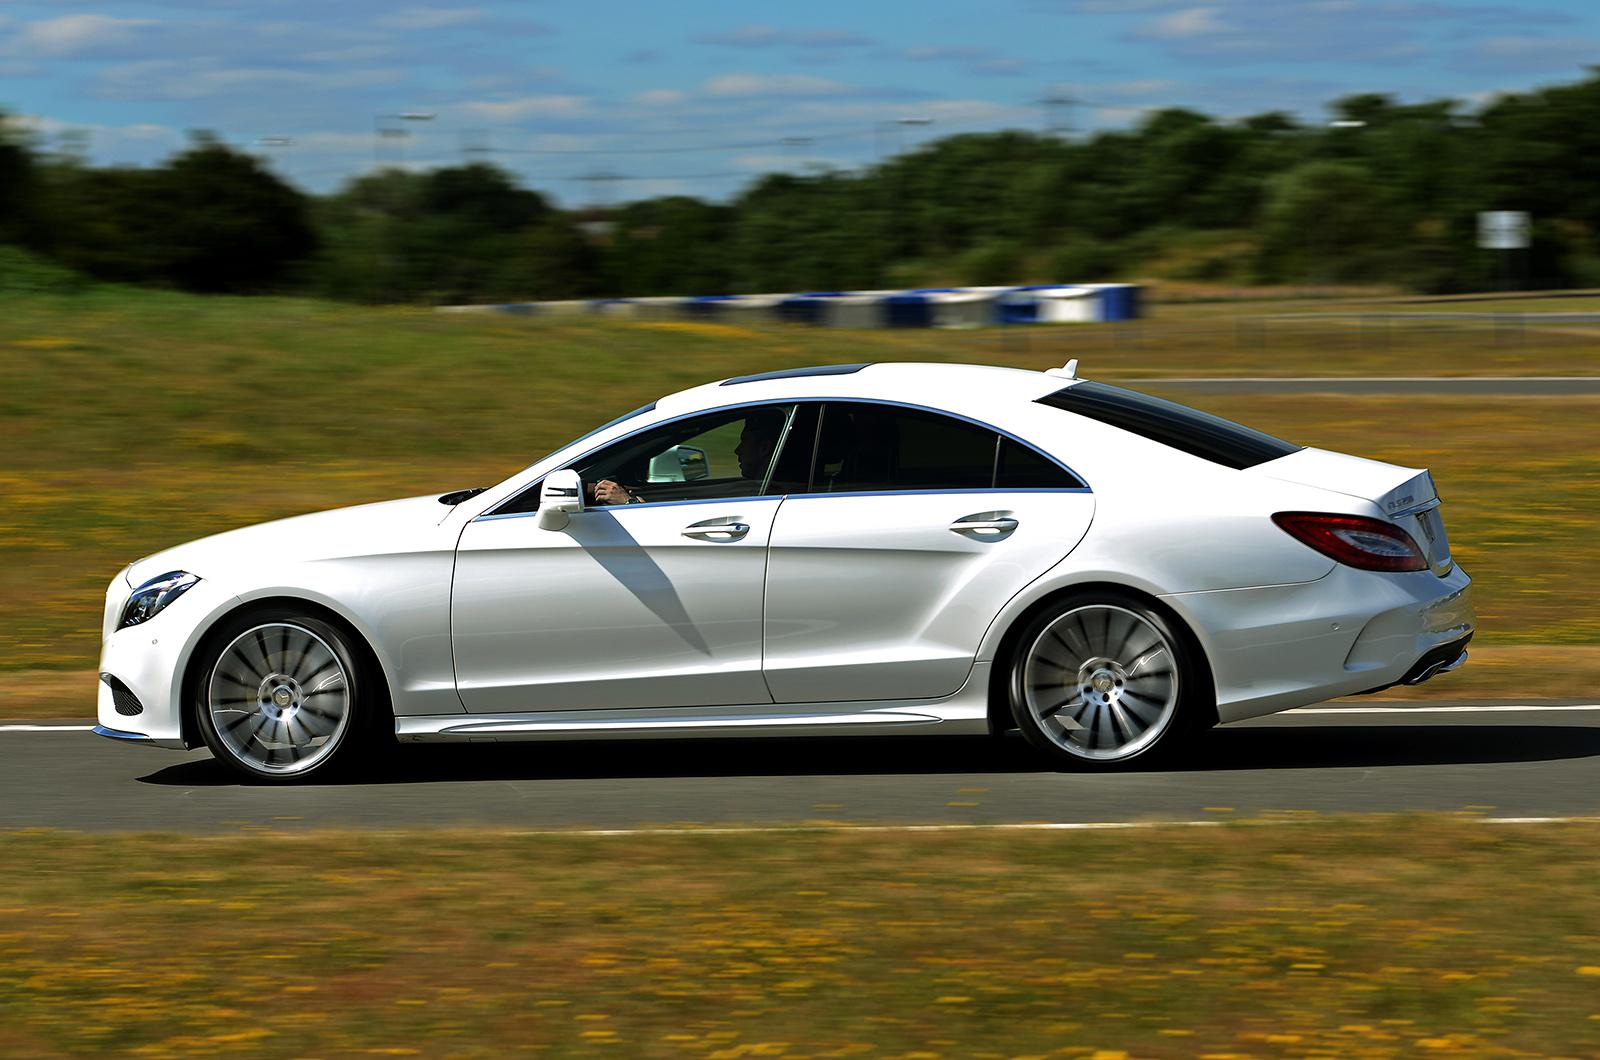 Mercedes-Benz CLS-Class (2015) - pictures, information & specs